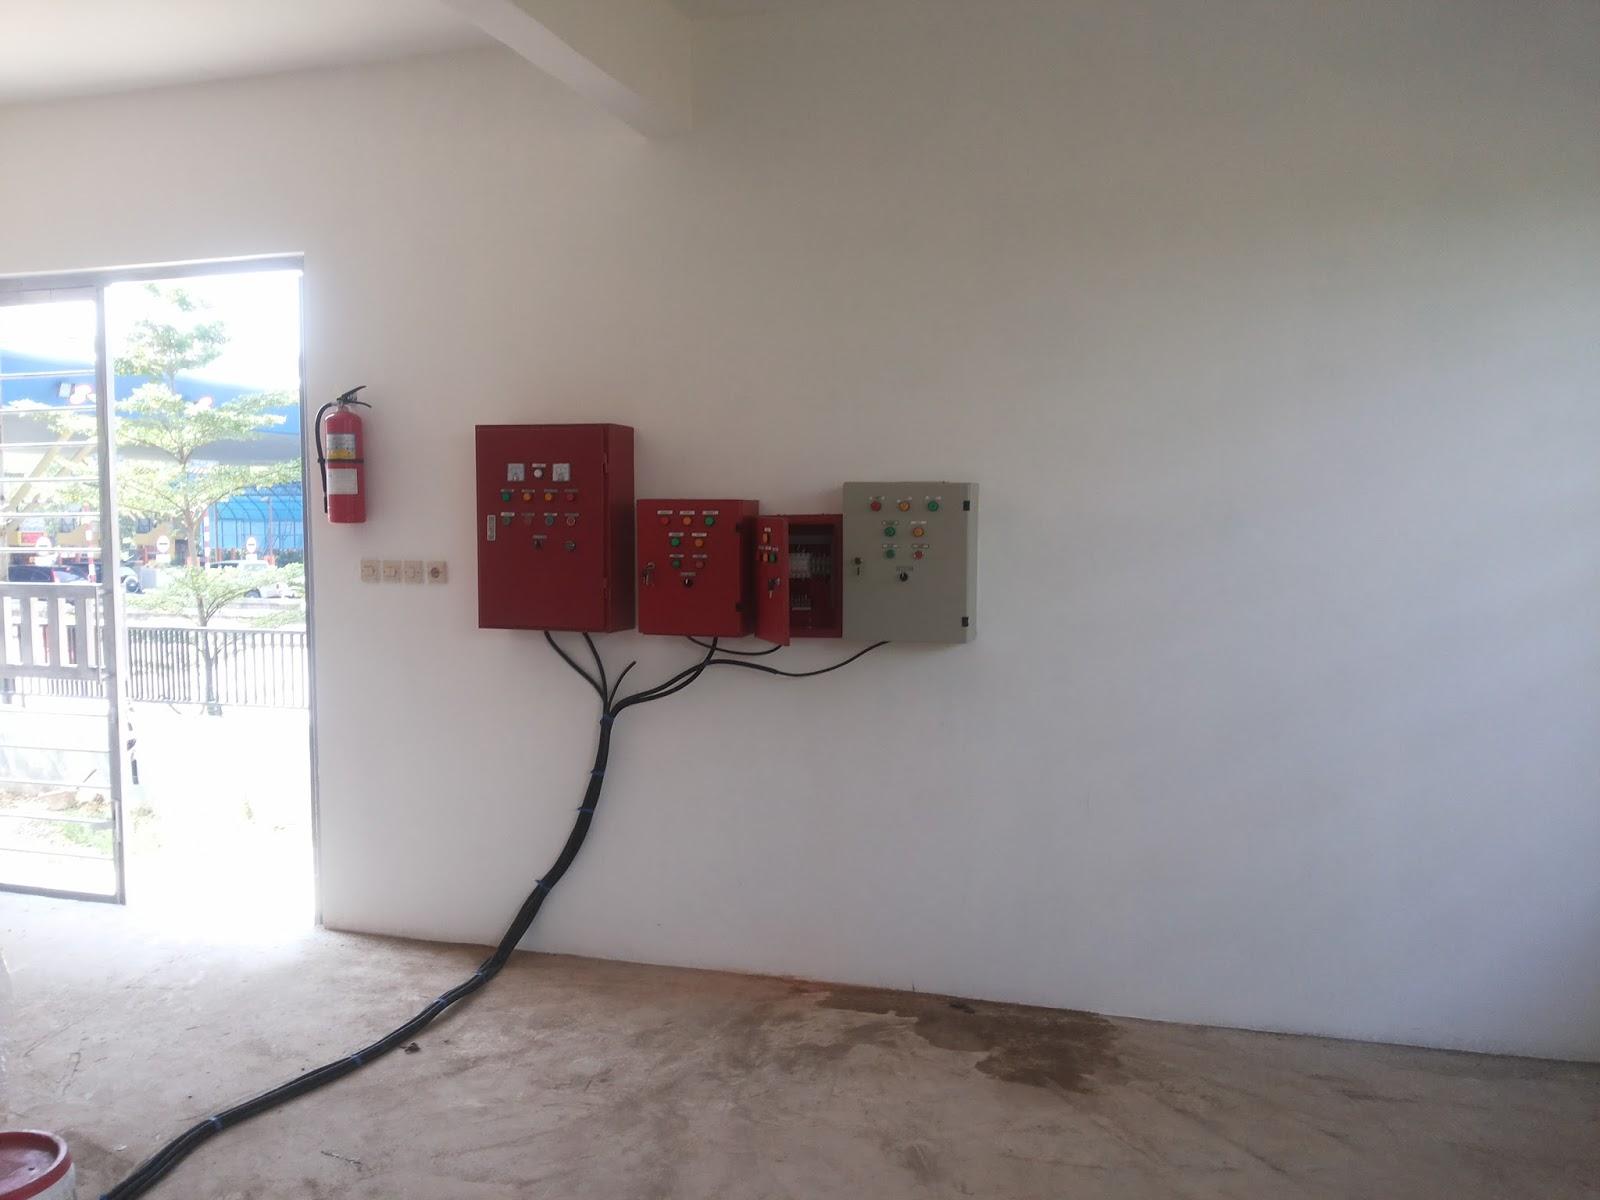 Pompa Hydrant Control Panel